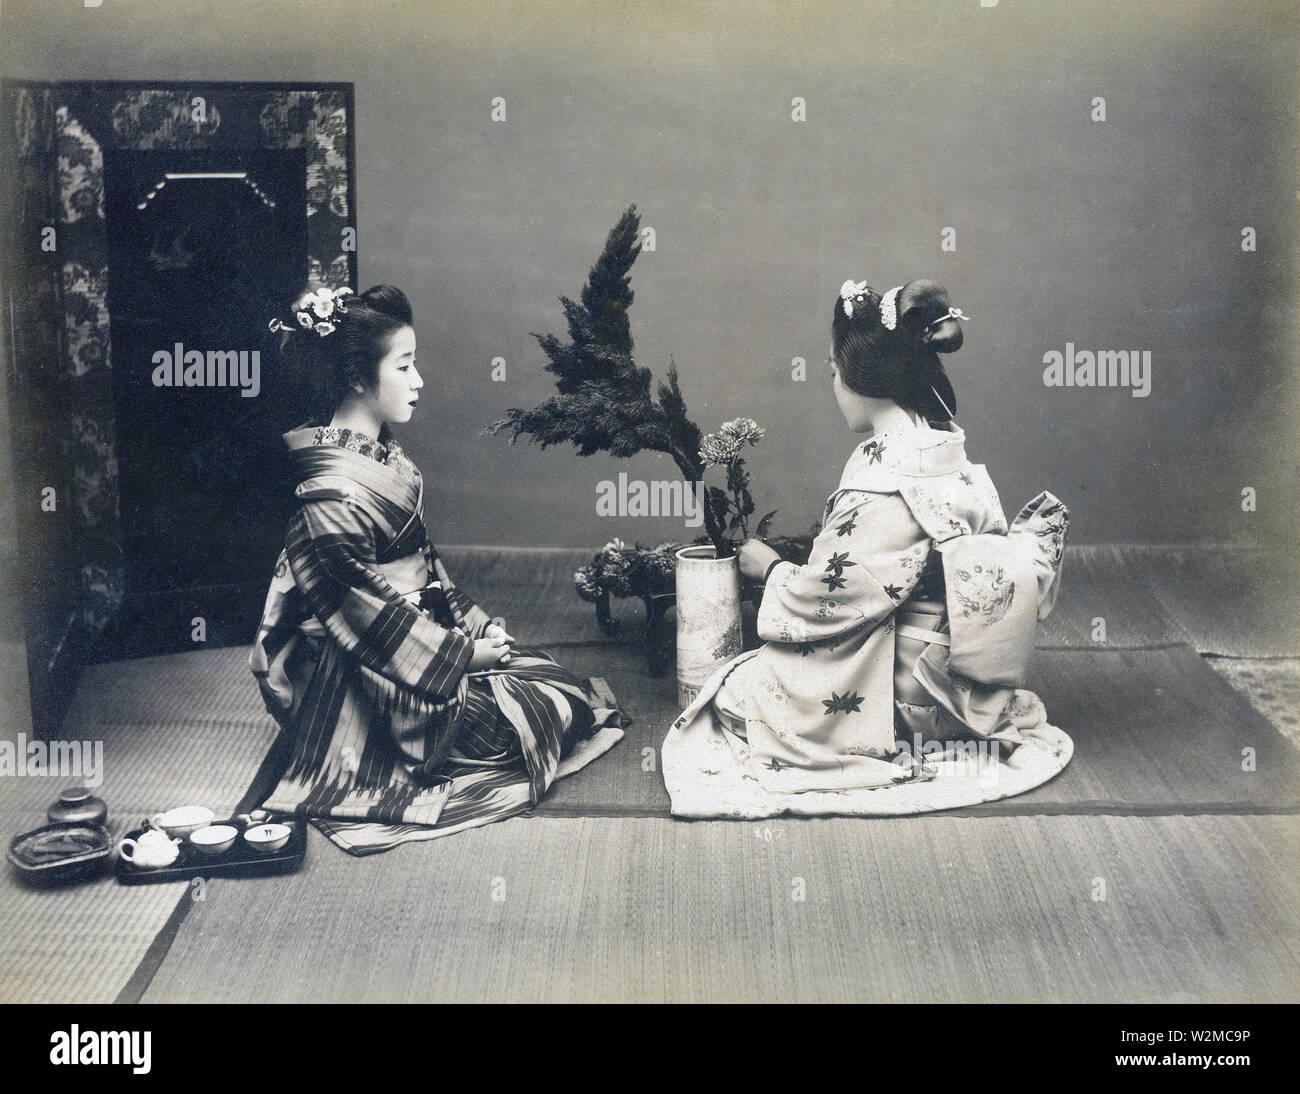 Japan women tending to flowers antique hand tinted albumen art photo